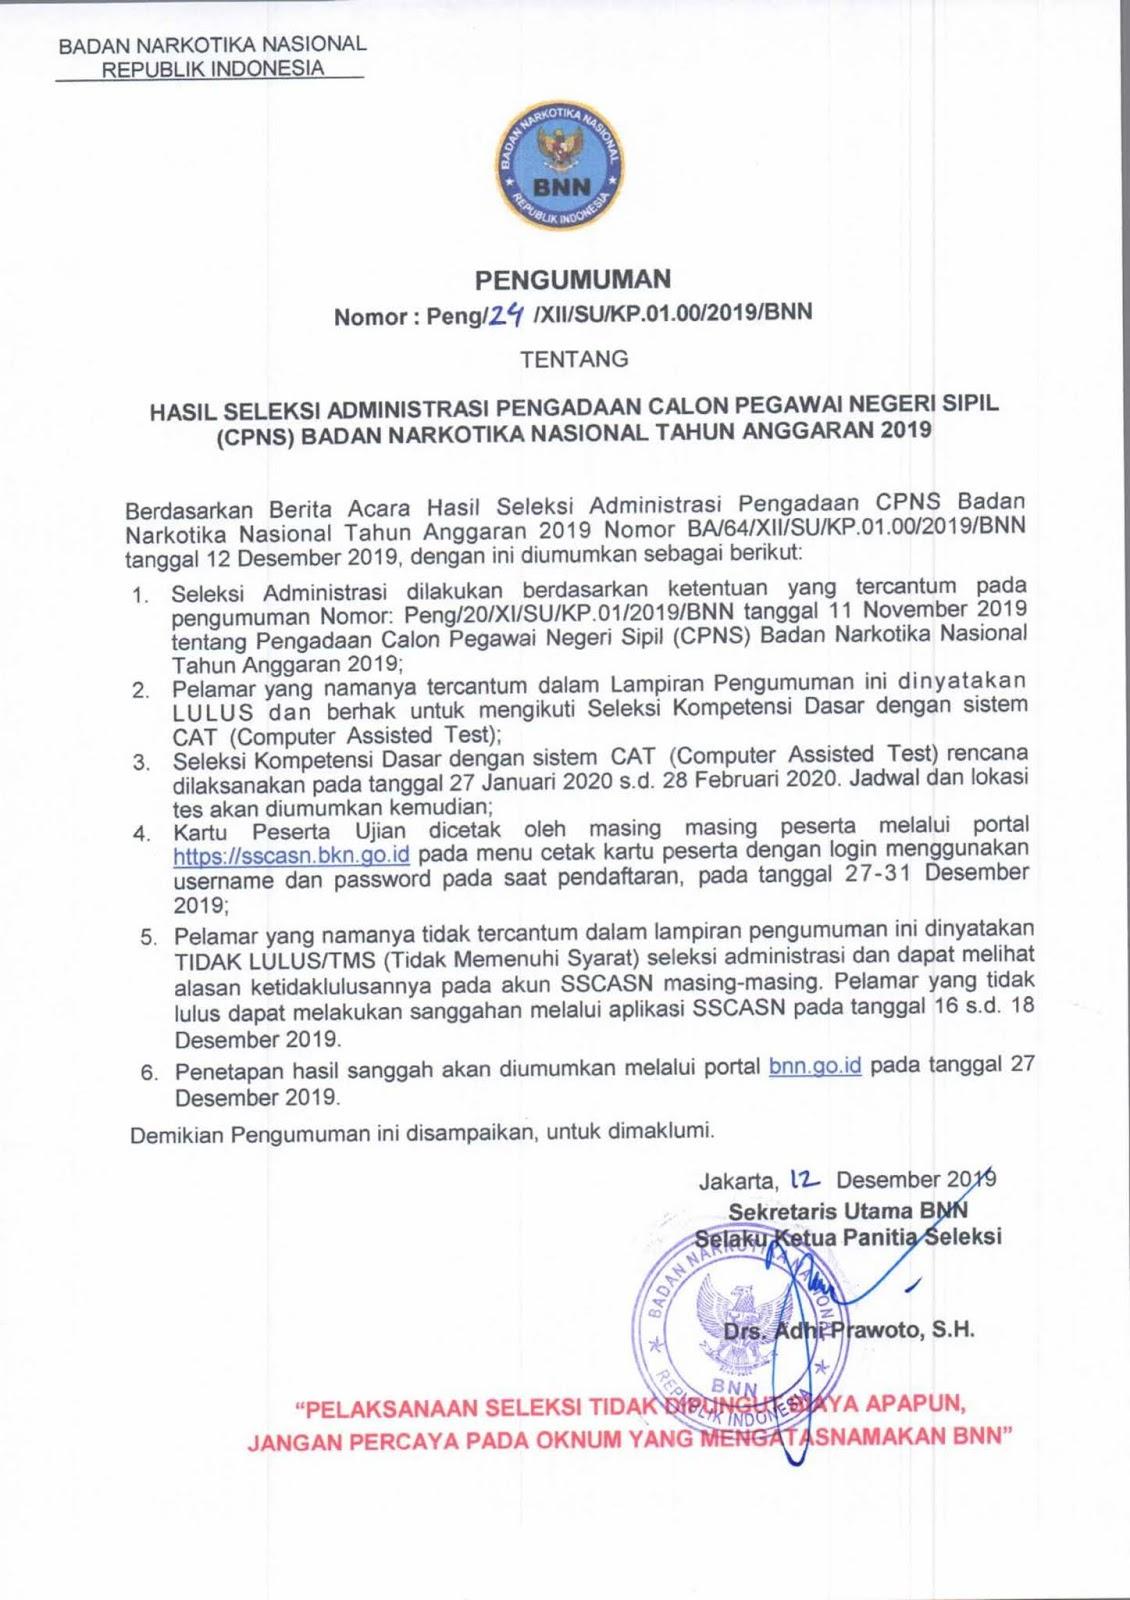 Hasil Seleksi Administrasi CPNS Badan Narkotika Nasional Tahun Anggaran 2019